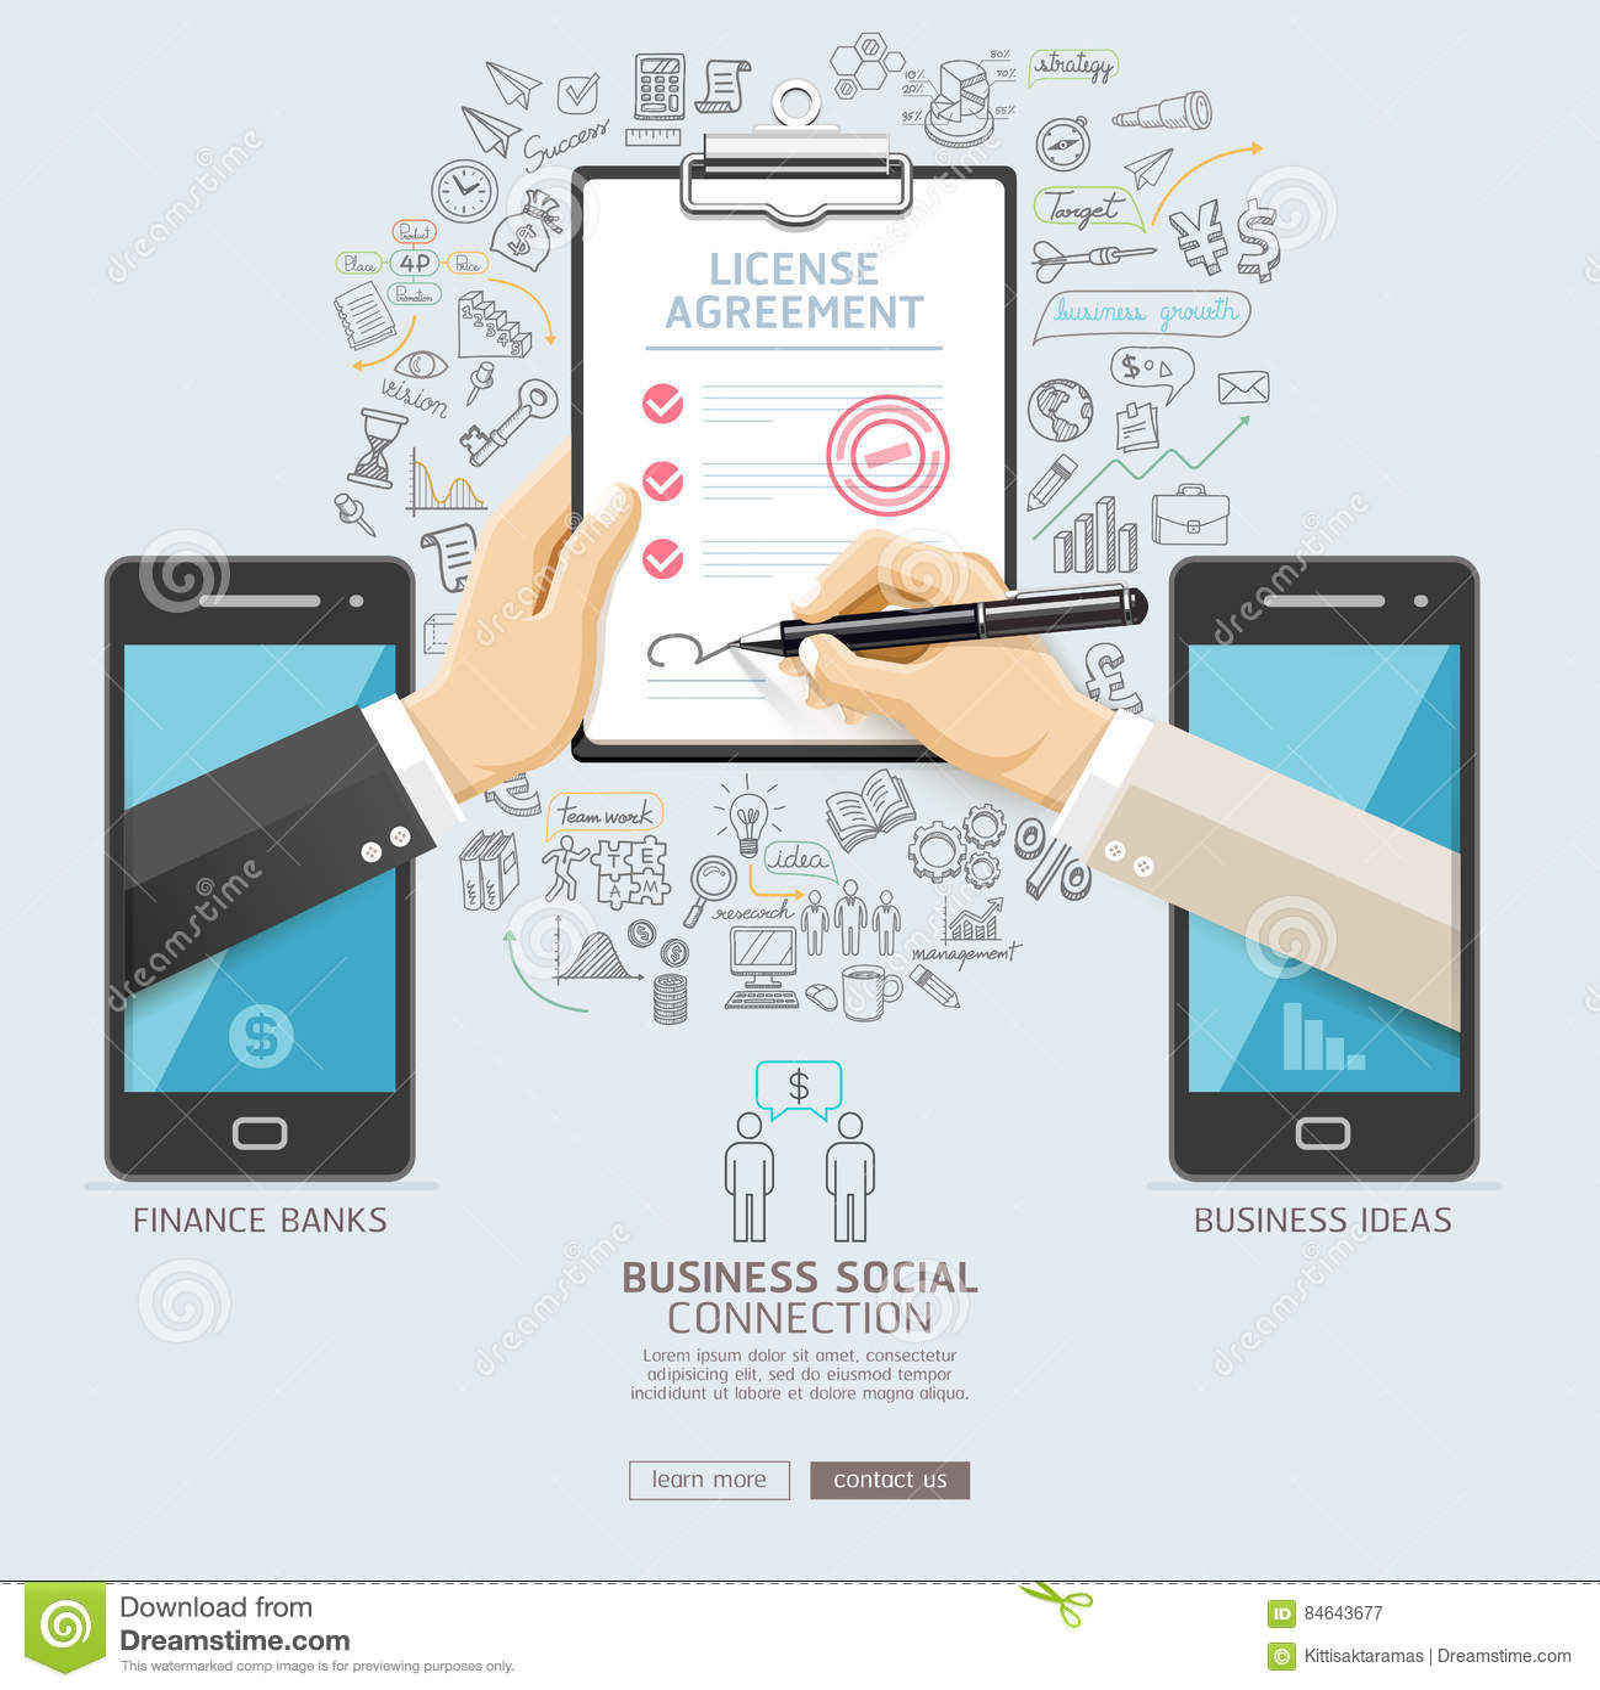 Business Social Connection Technology Conceptual Design Stock